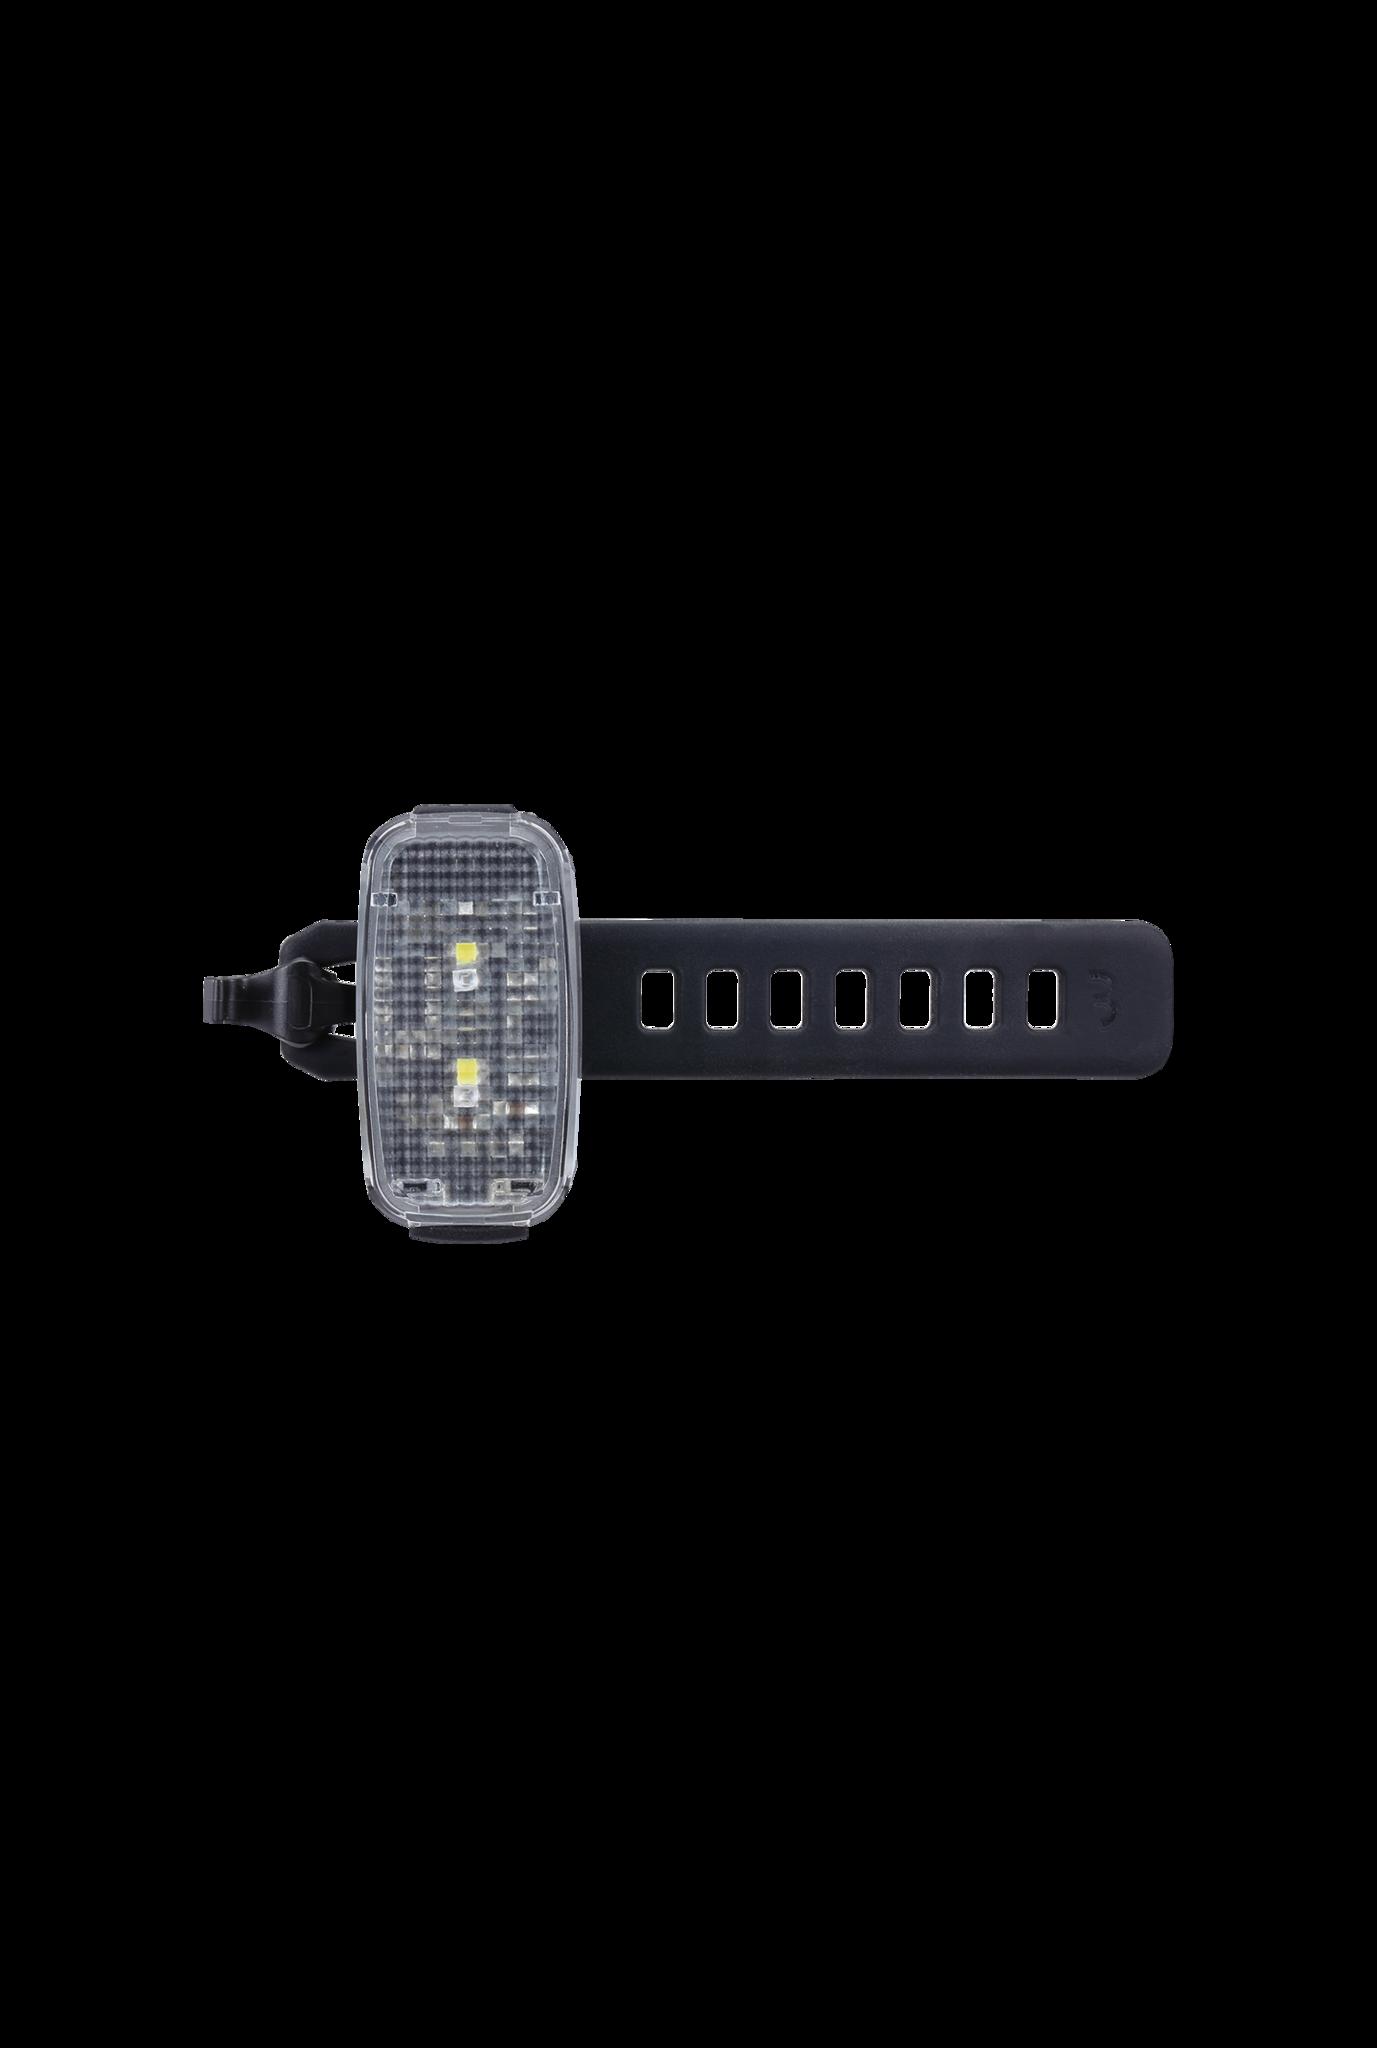 verlichtingsset SpotDuo-2